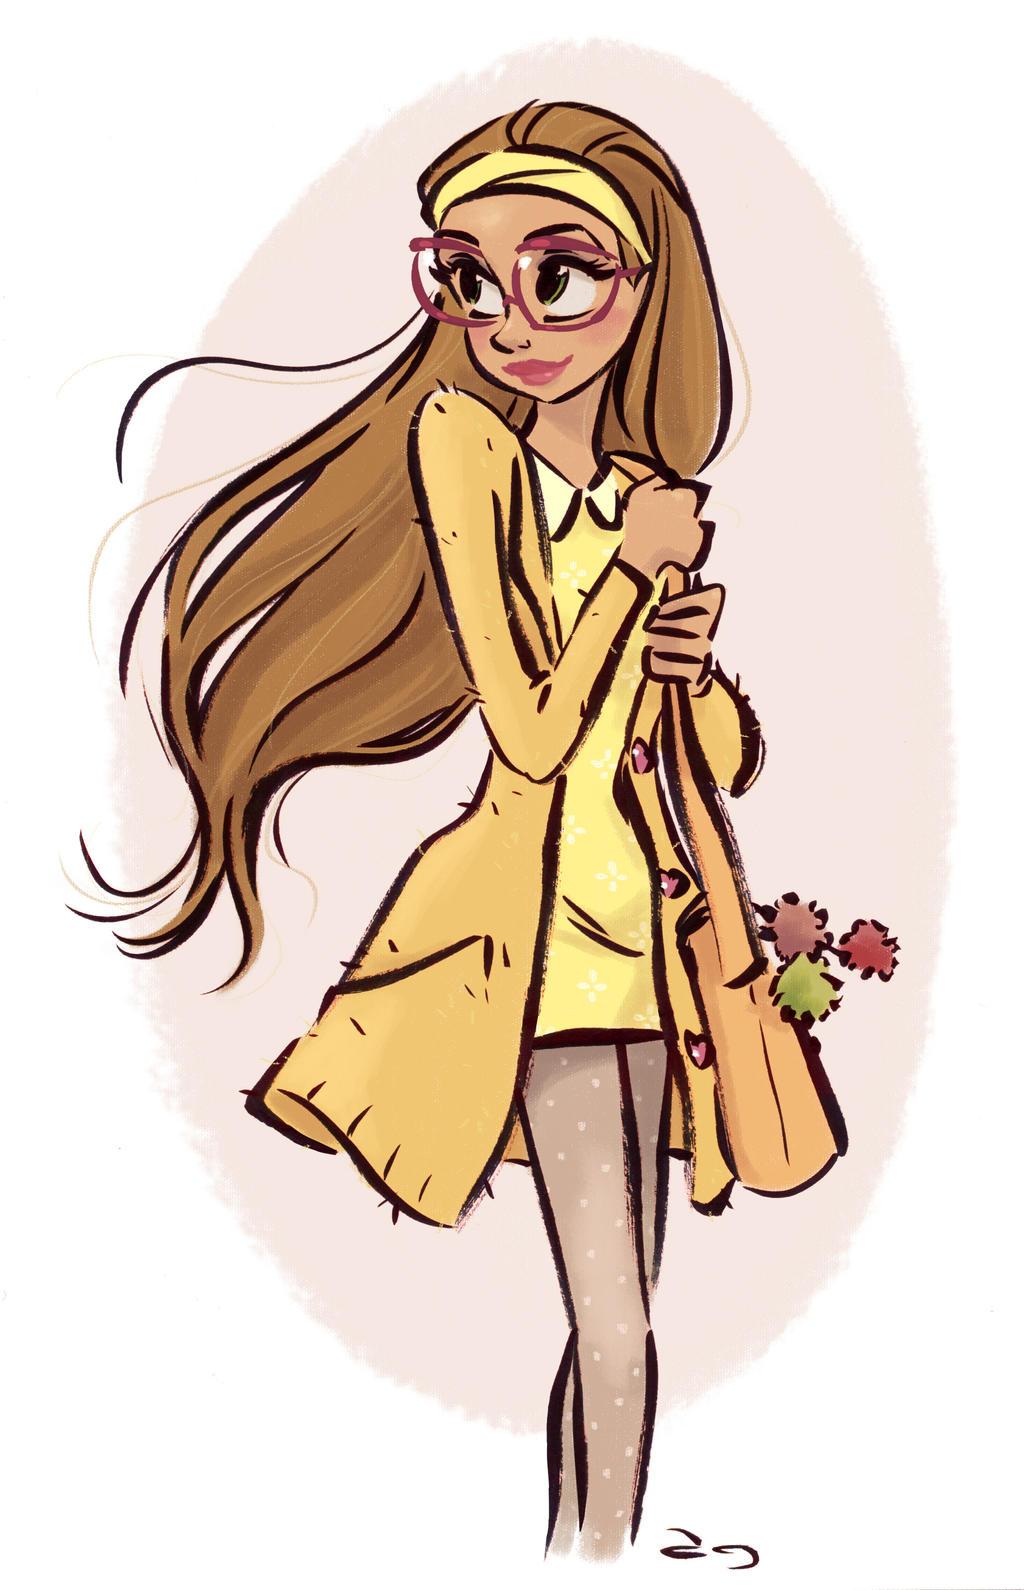 Big Hero 6 Anime Characters : Honey lemon from disney s big hero by princekido on